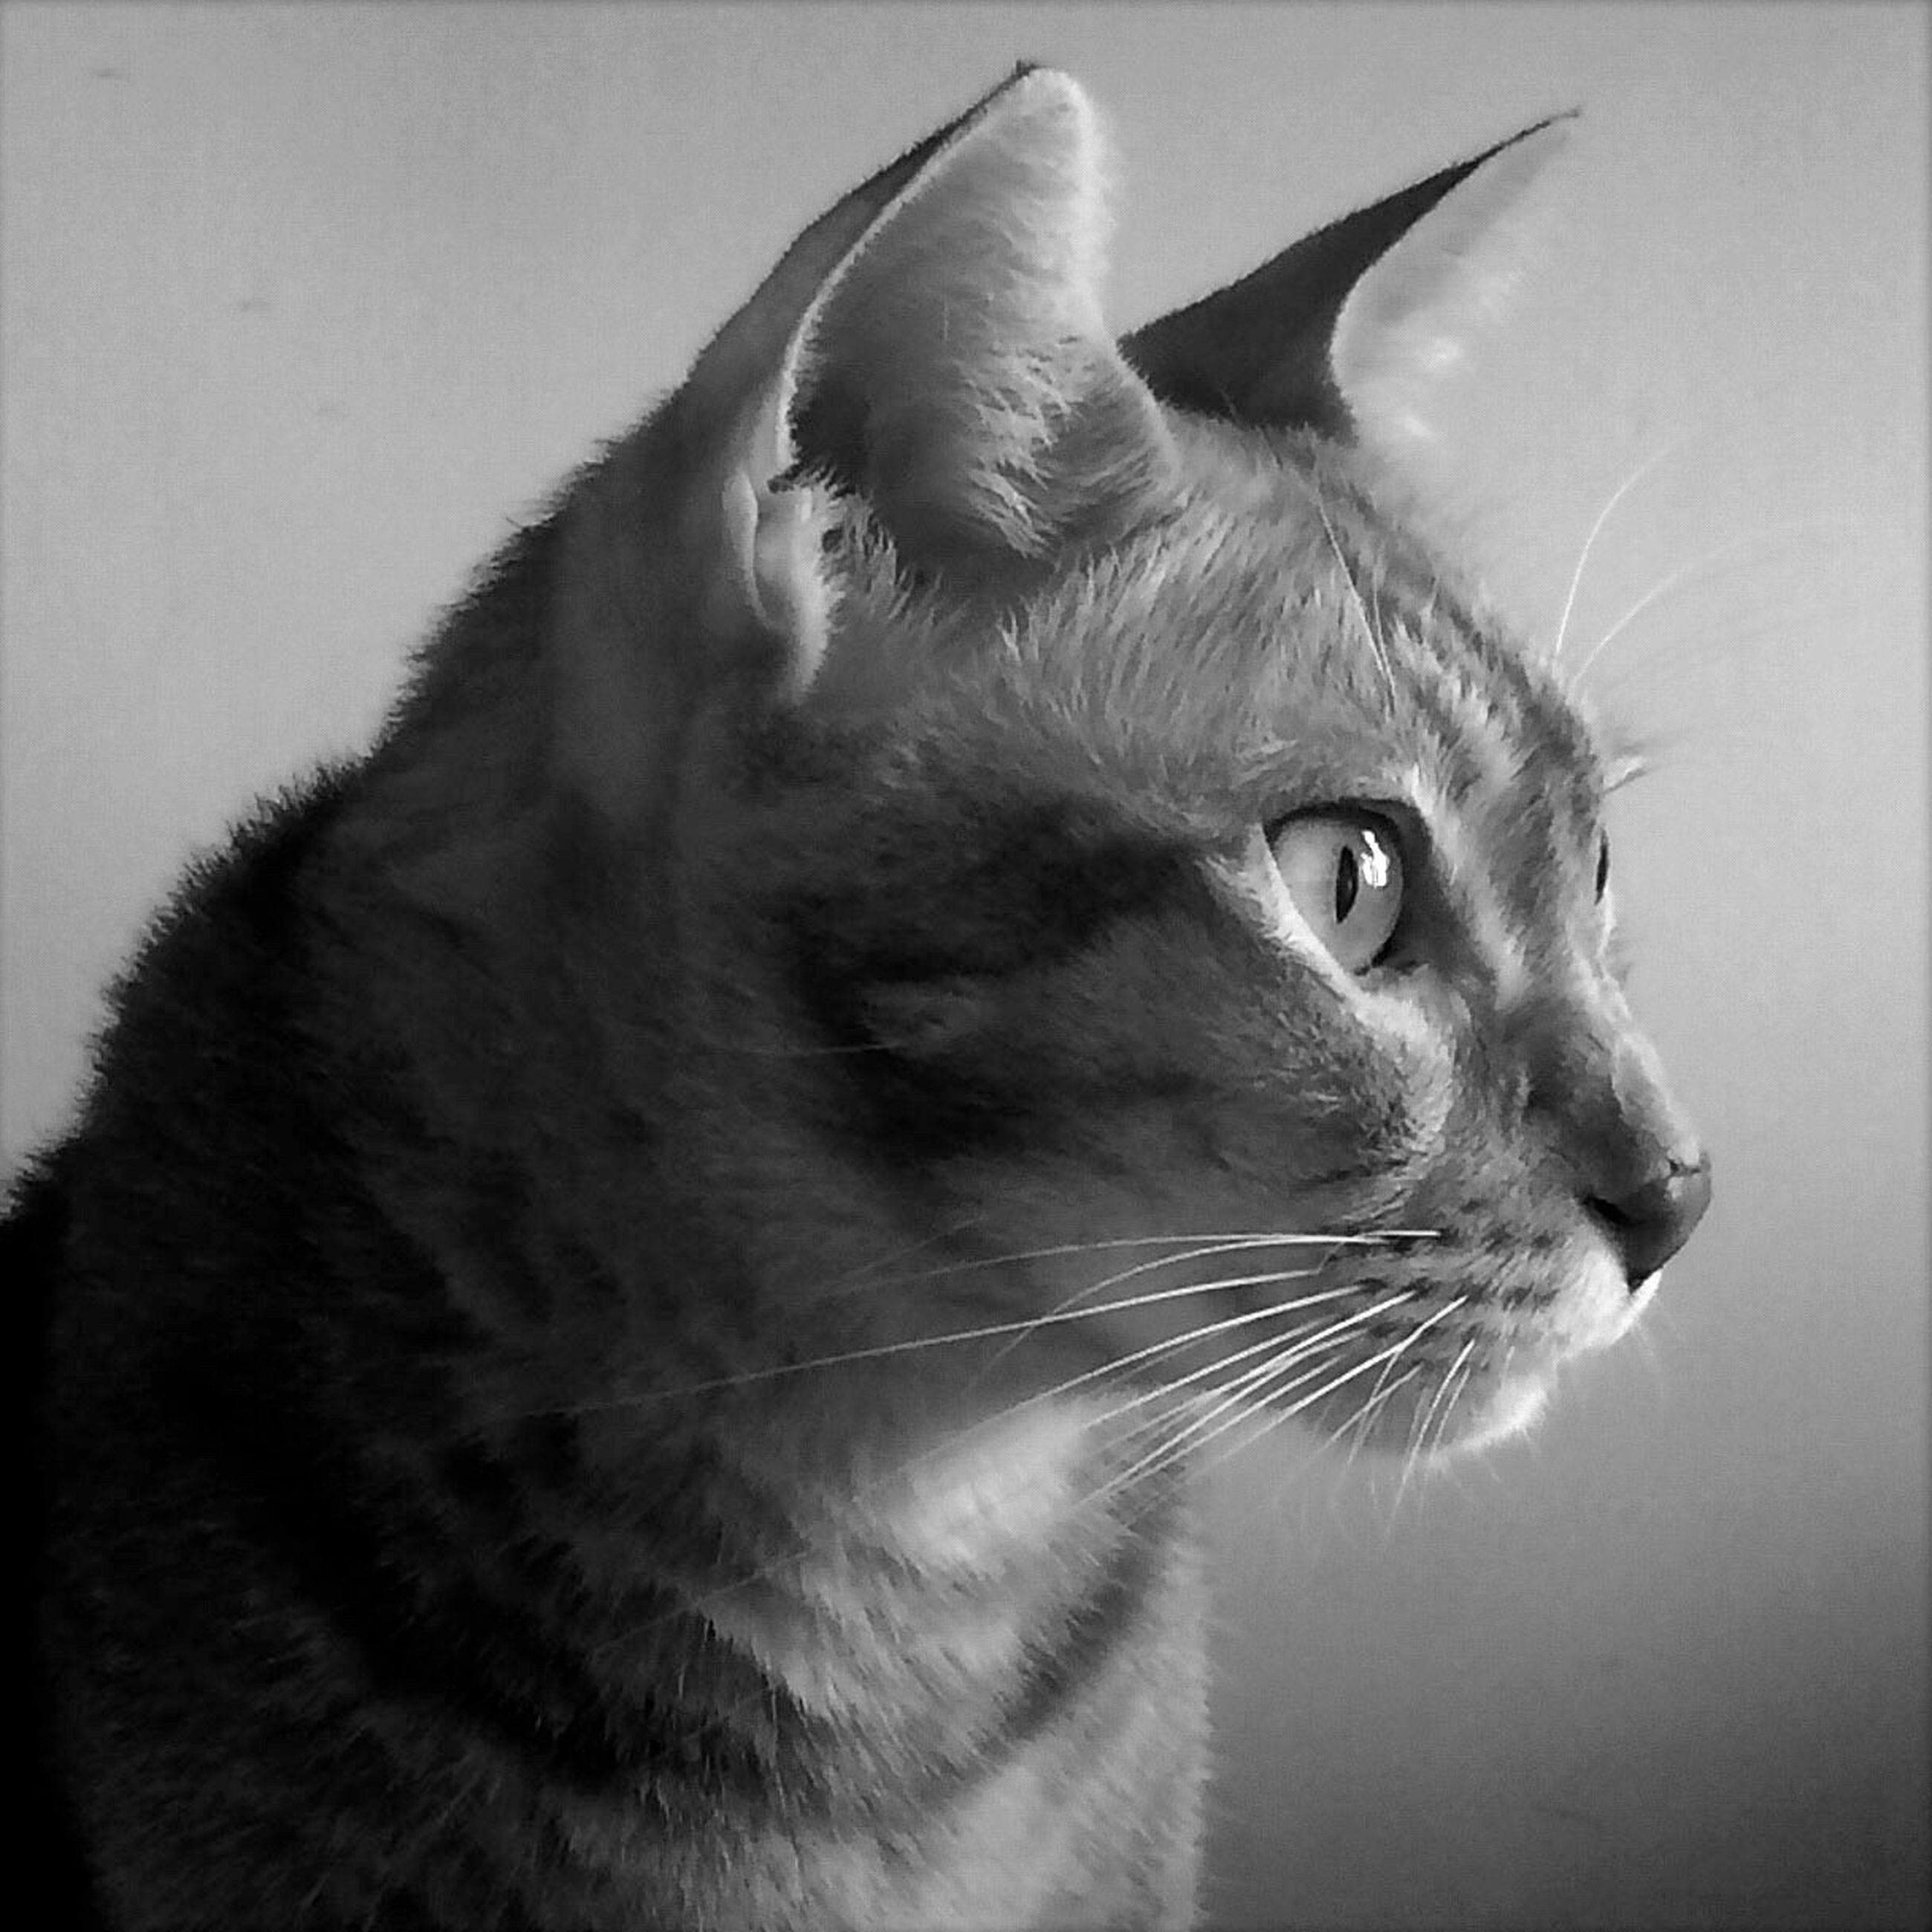 one animal, domestic cat, animal themes, cat, pets, domestic animals, feline, whisker, mammal, indoors, close-up, animal head, looking away, animal eye, alertness, no people, animal body part, zoology, animal, vertebrate